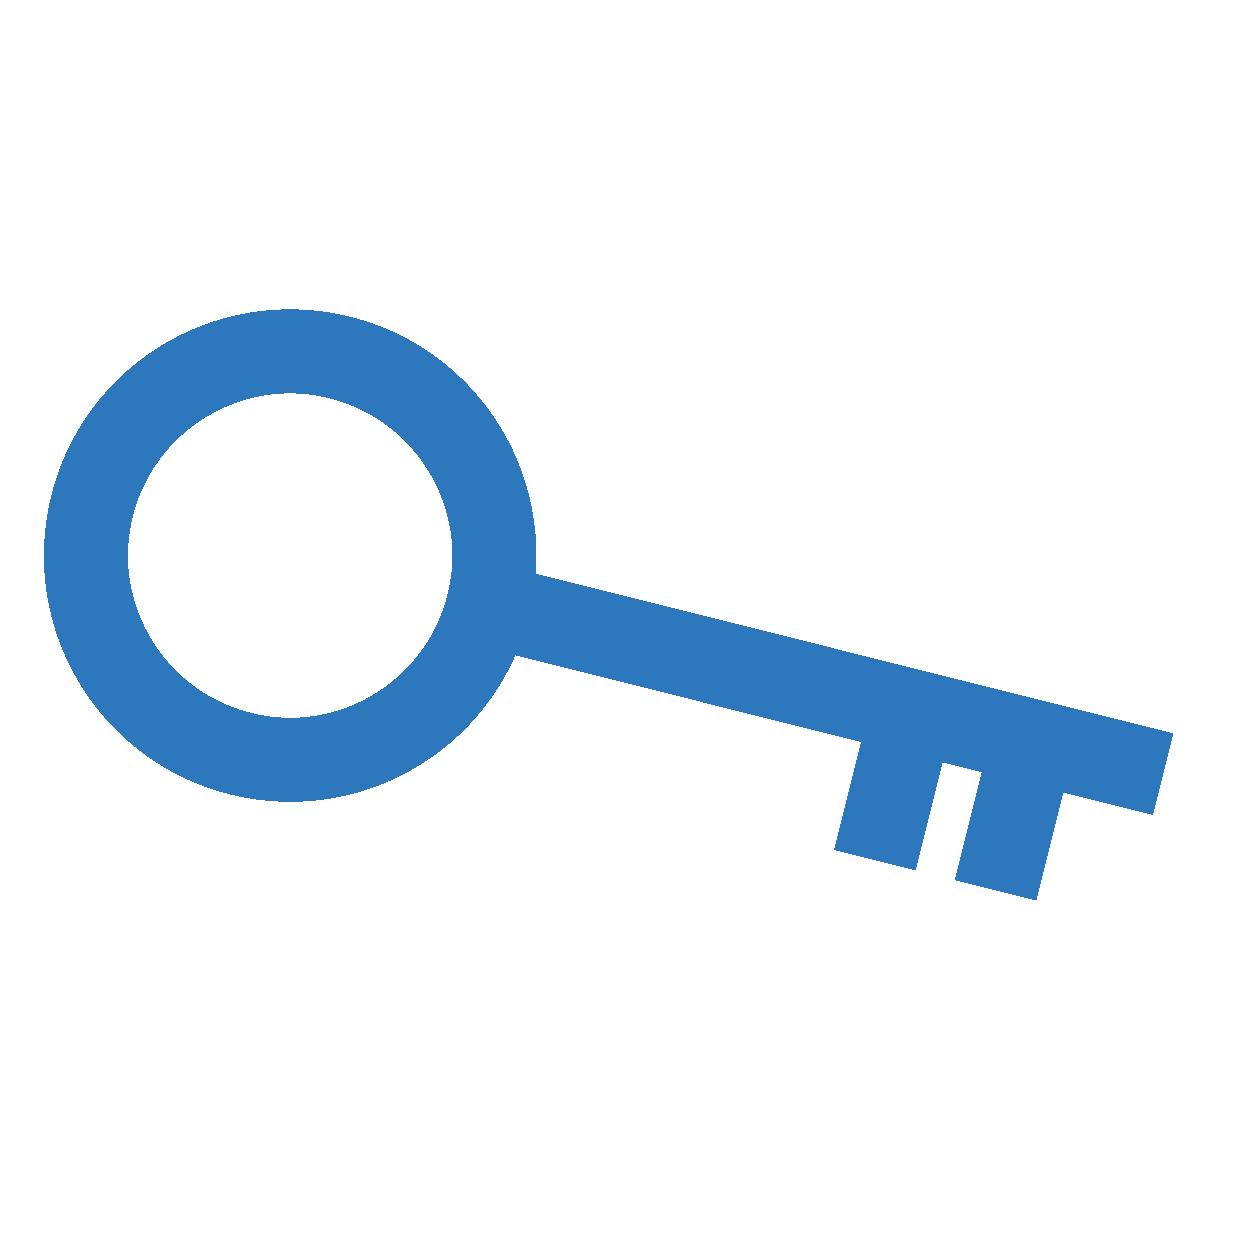 Clipart key property management. Pointcentral rent manager software